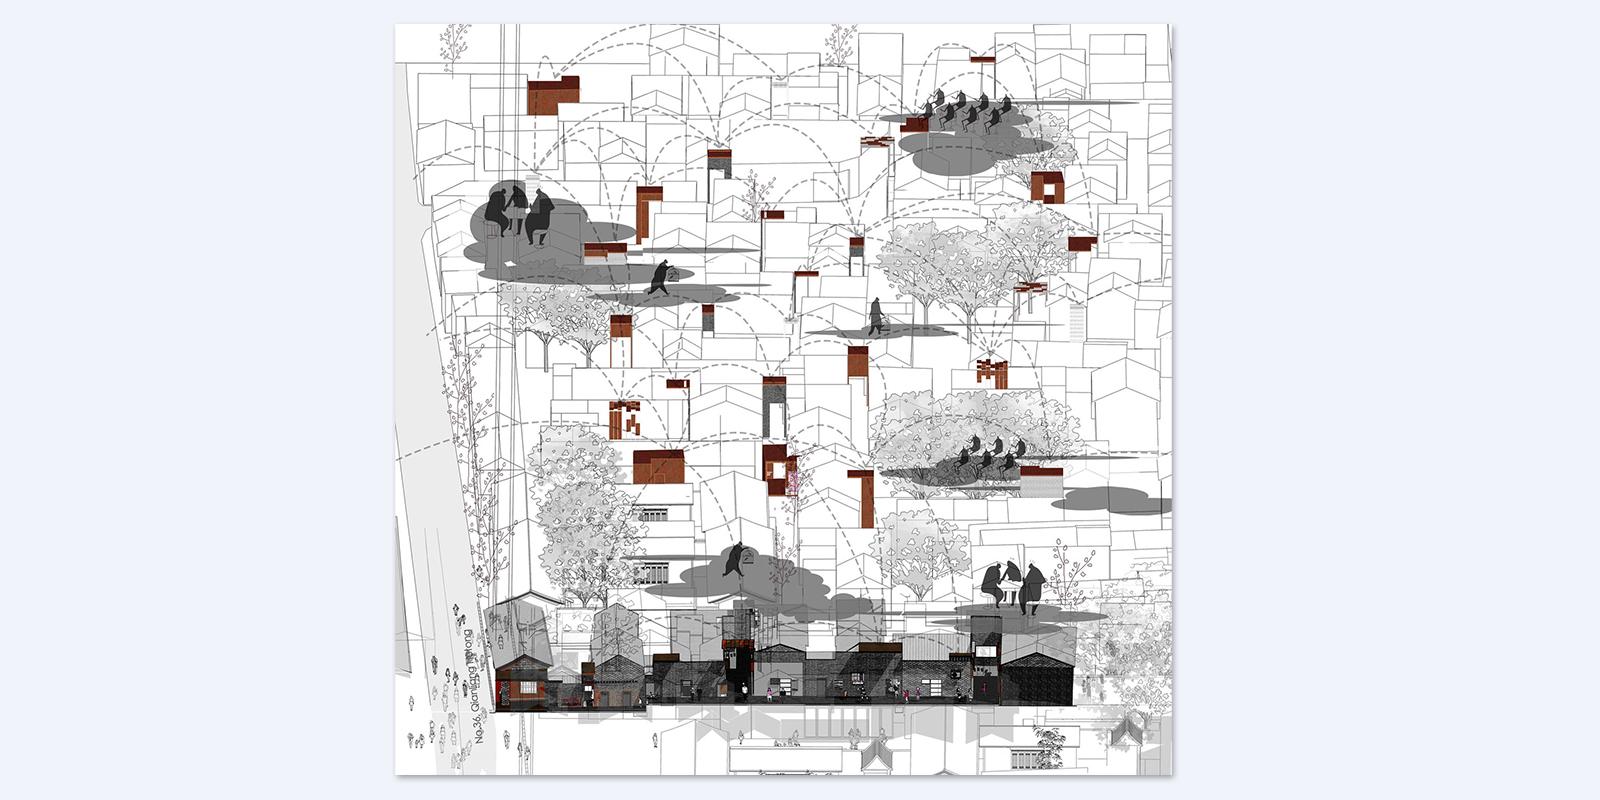 8. Urban network of the micro community center